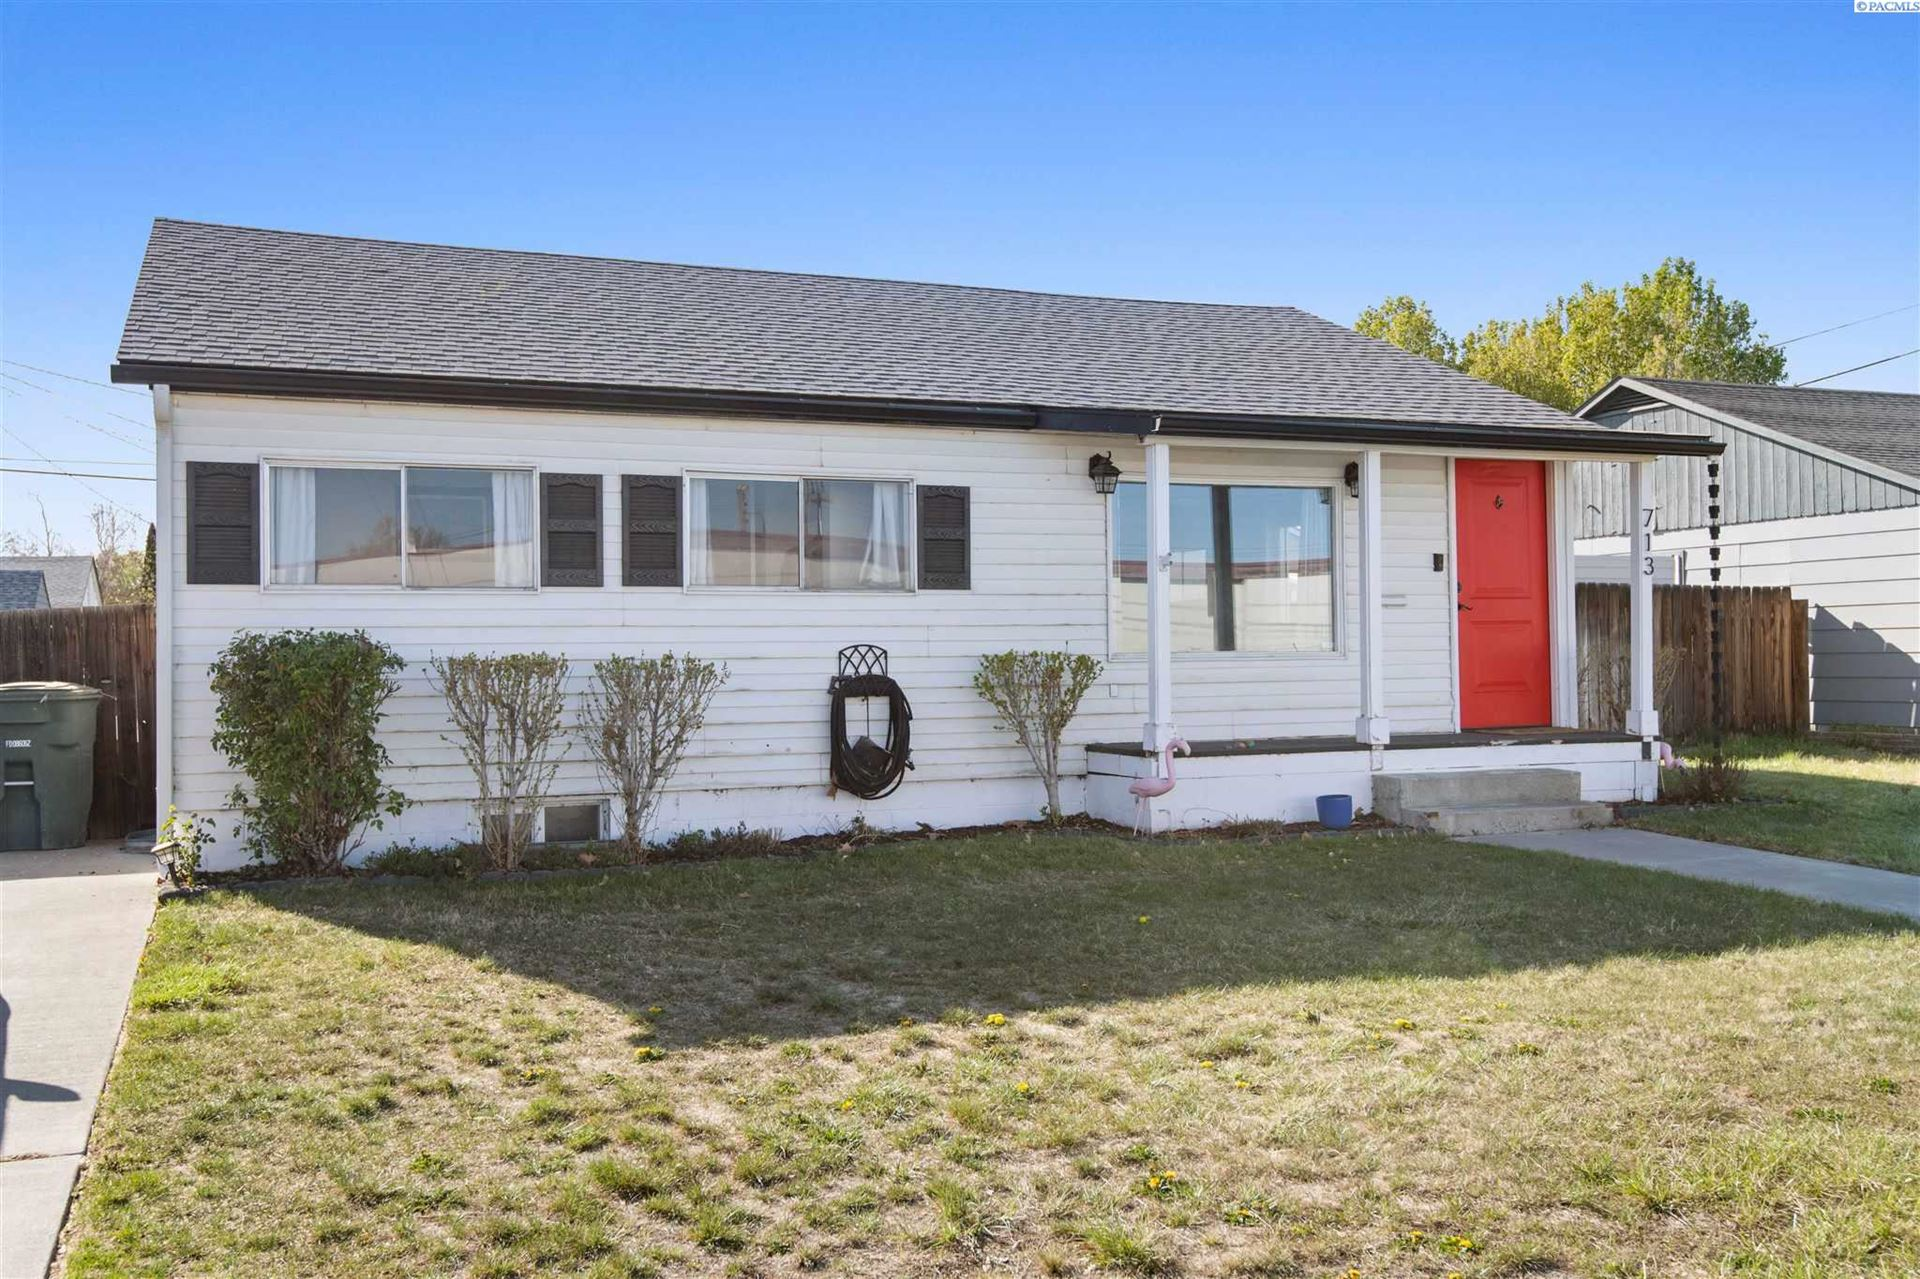 Photo of 713 Thayer, Richland, WA 99352 (MLS # 252905)